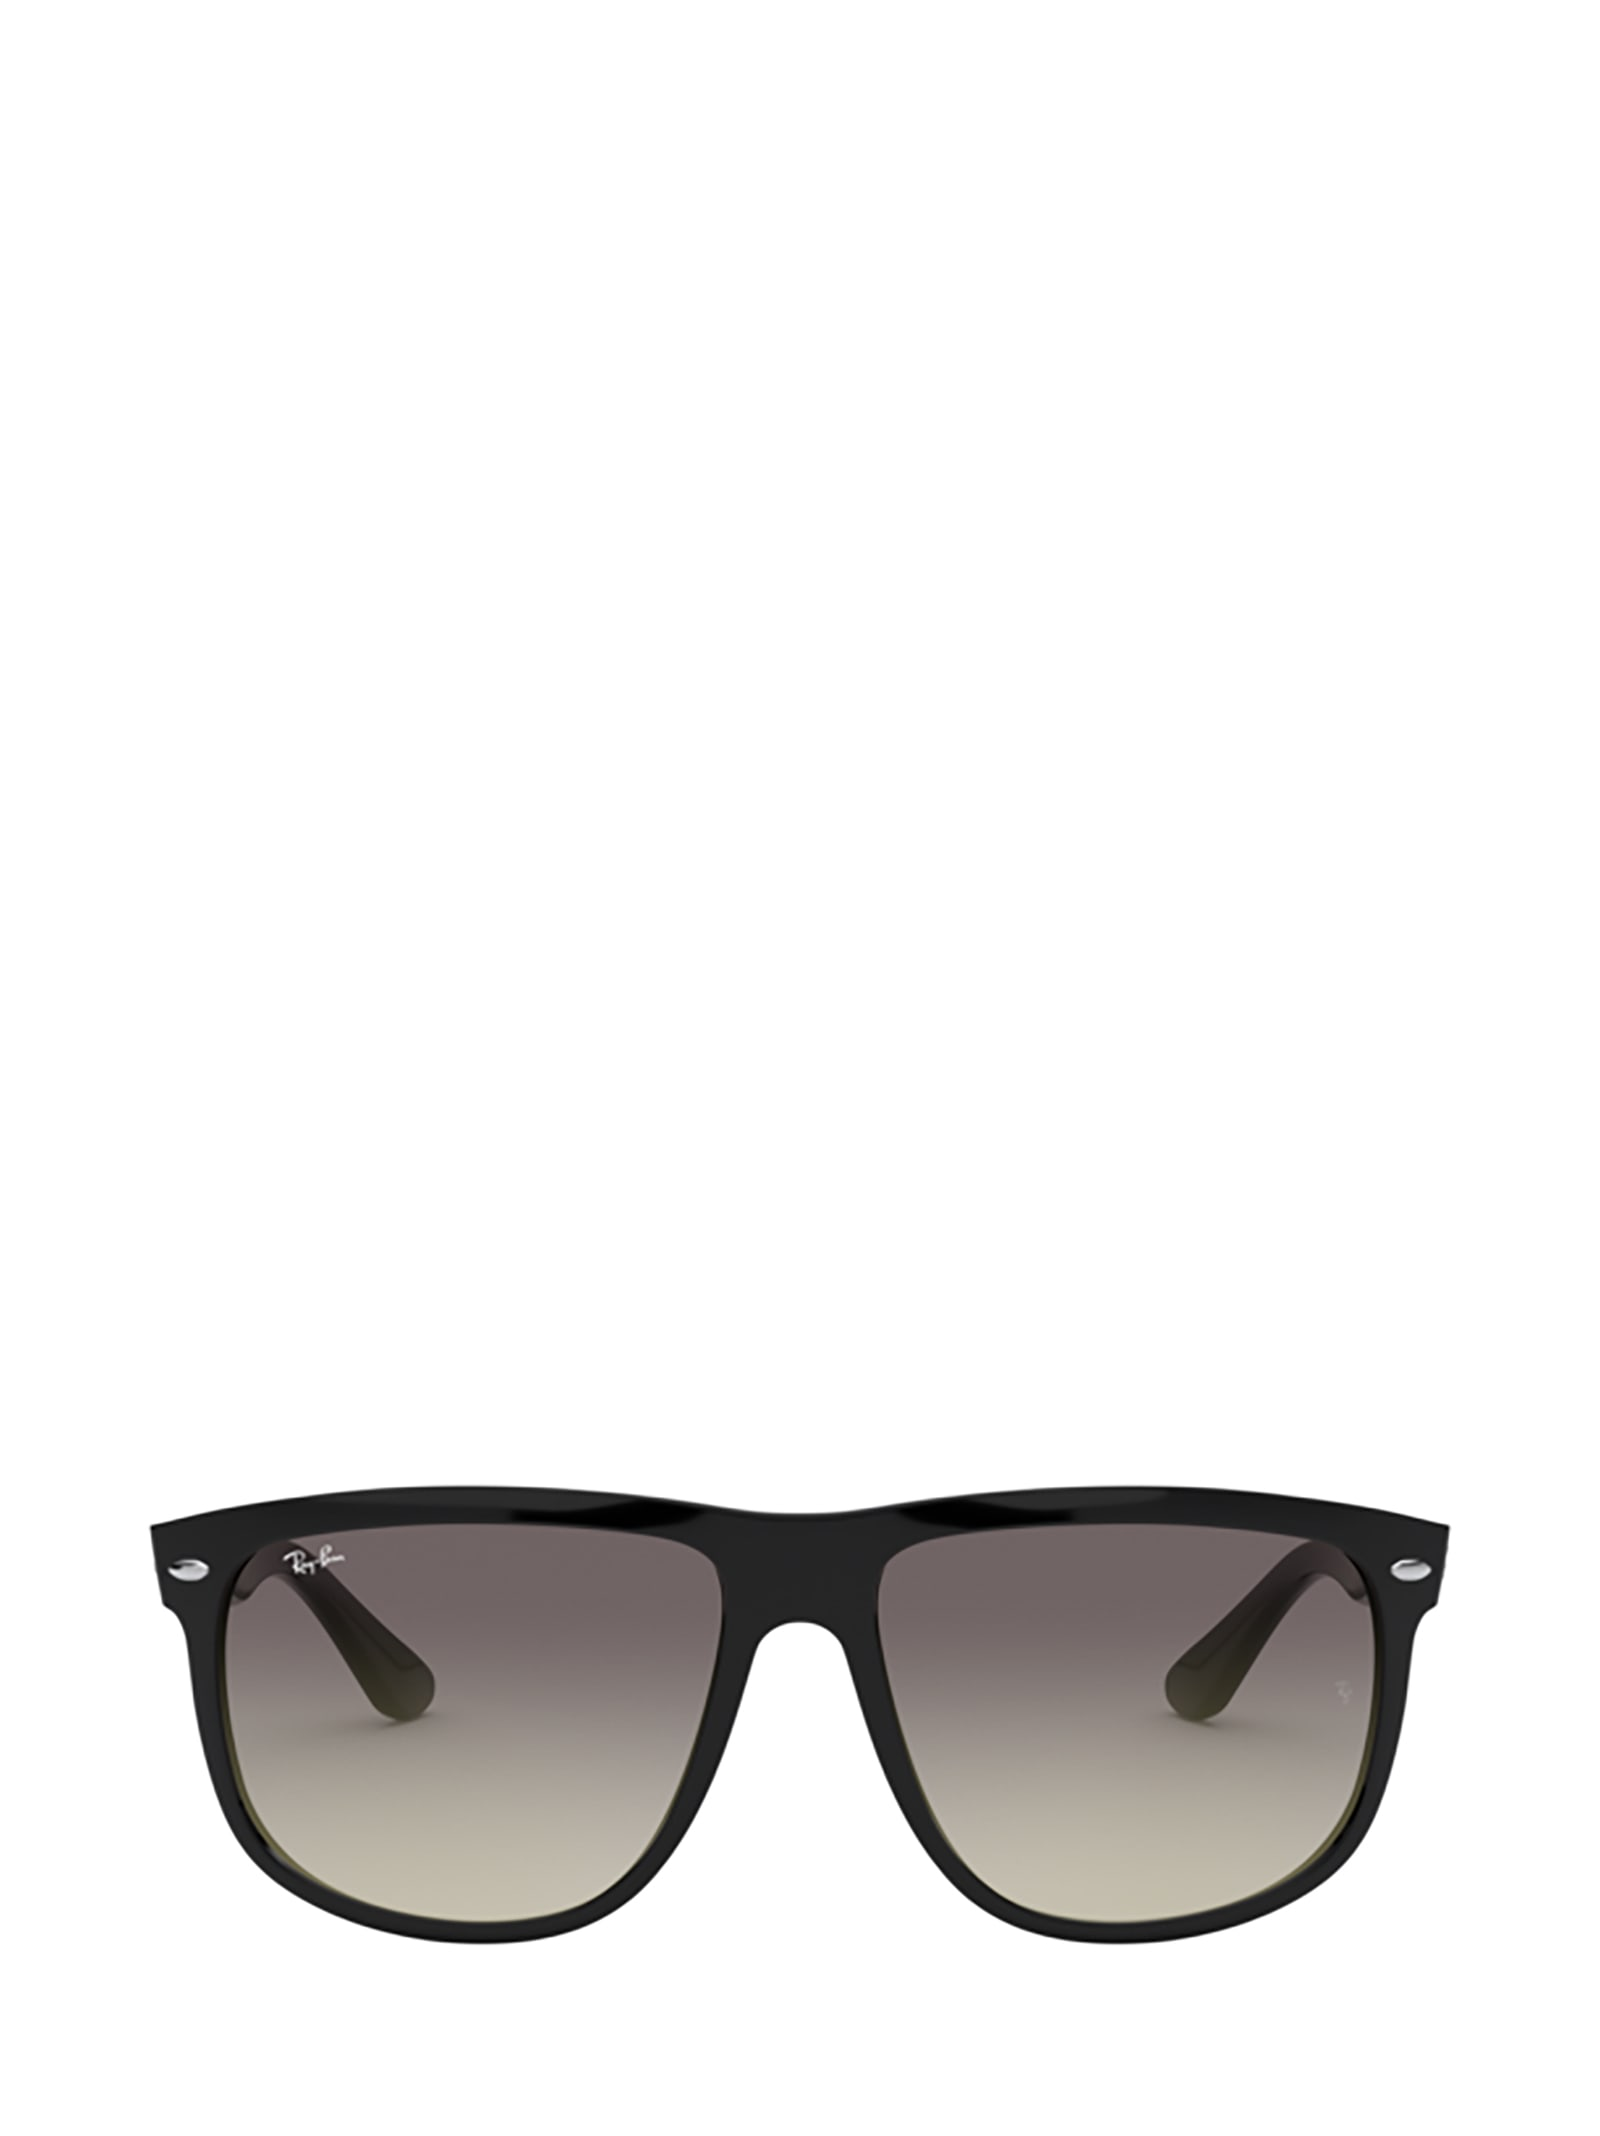 Ray-Ban Ray-ban Rb4147 Black Sunglasses